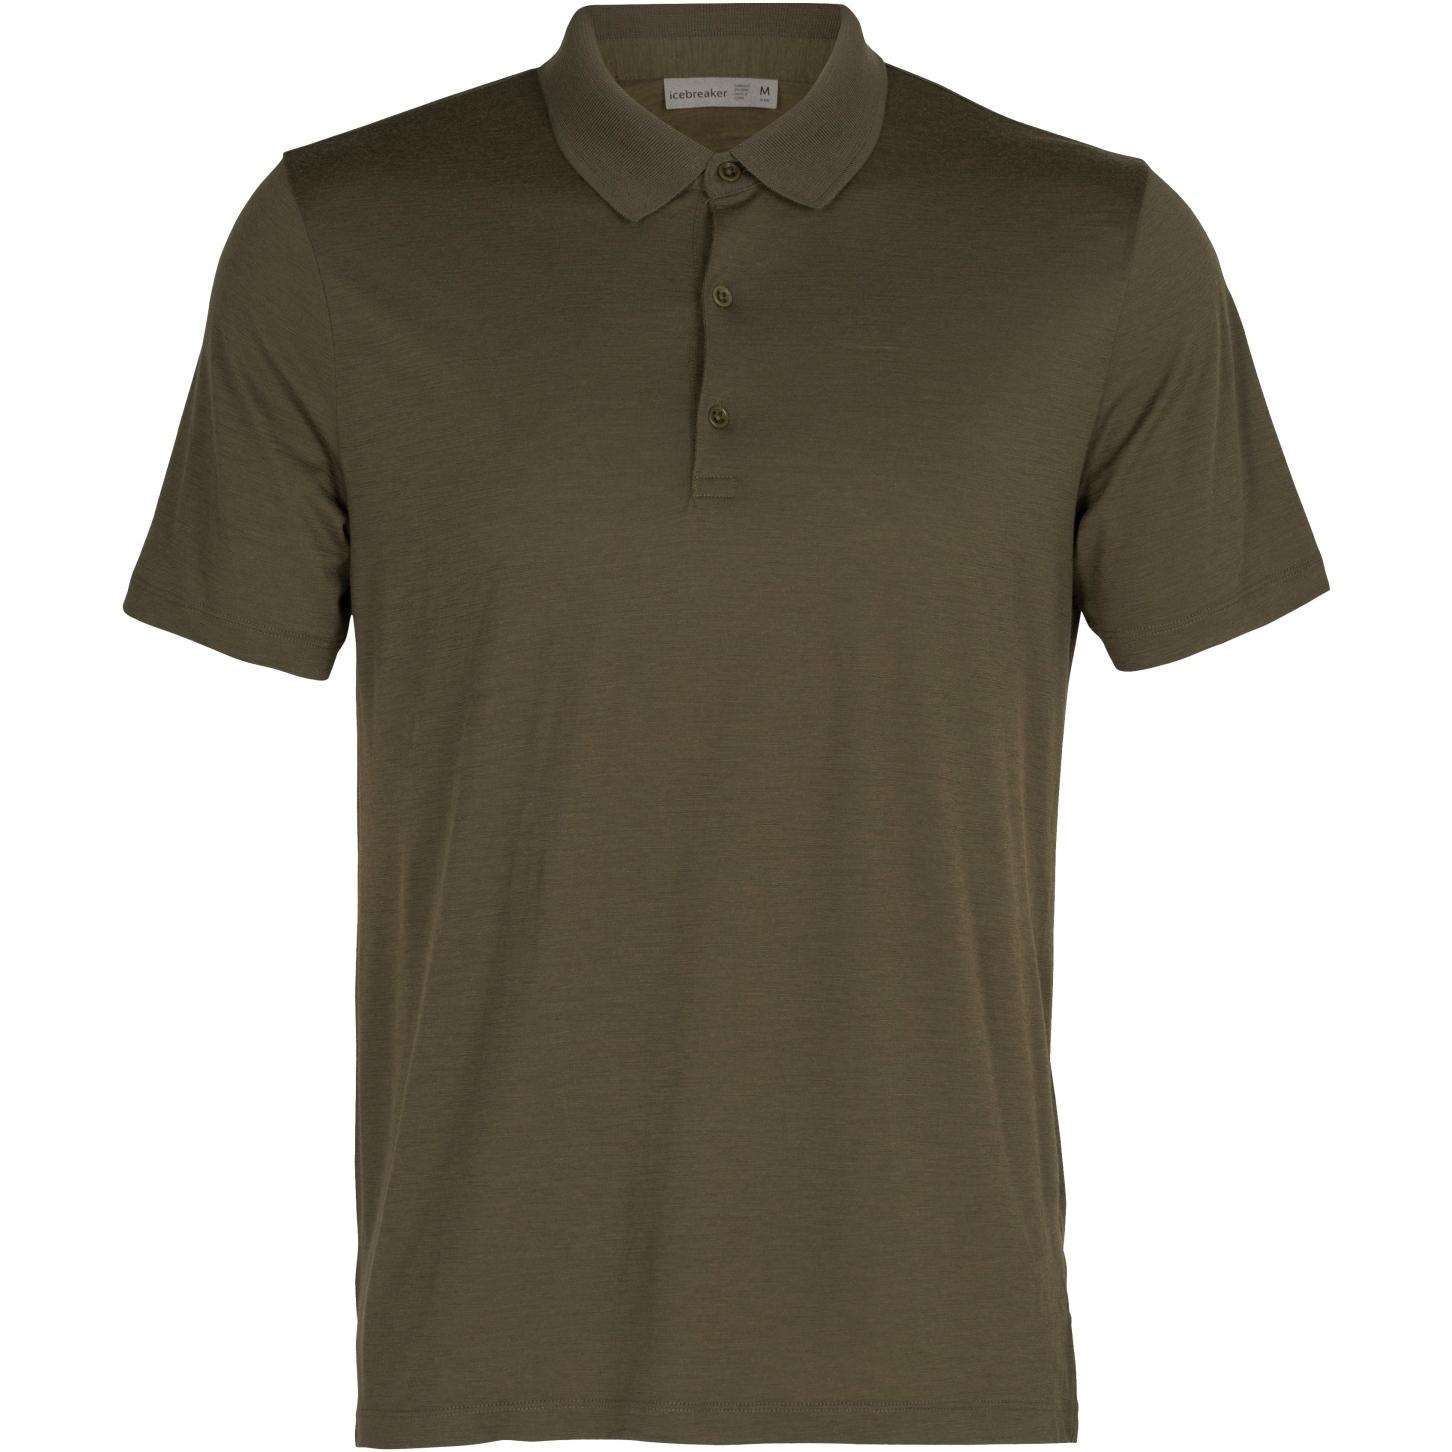 Icebreaker Tech Lite II Herren Polo-Shirt - Loden